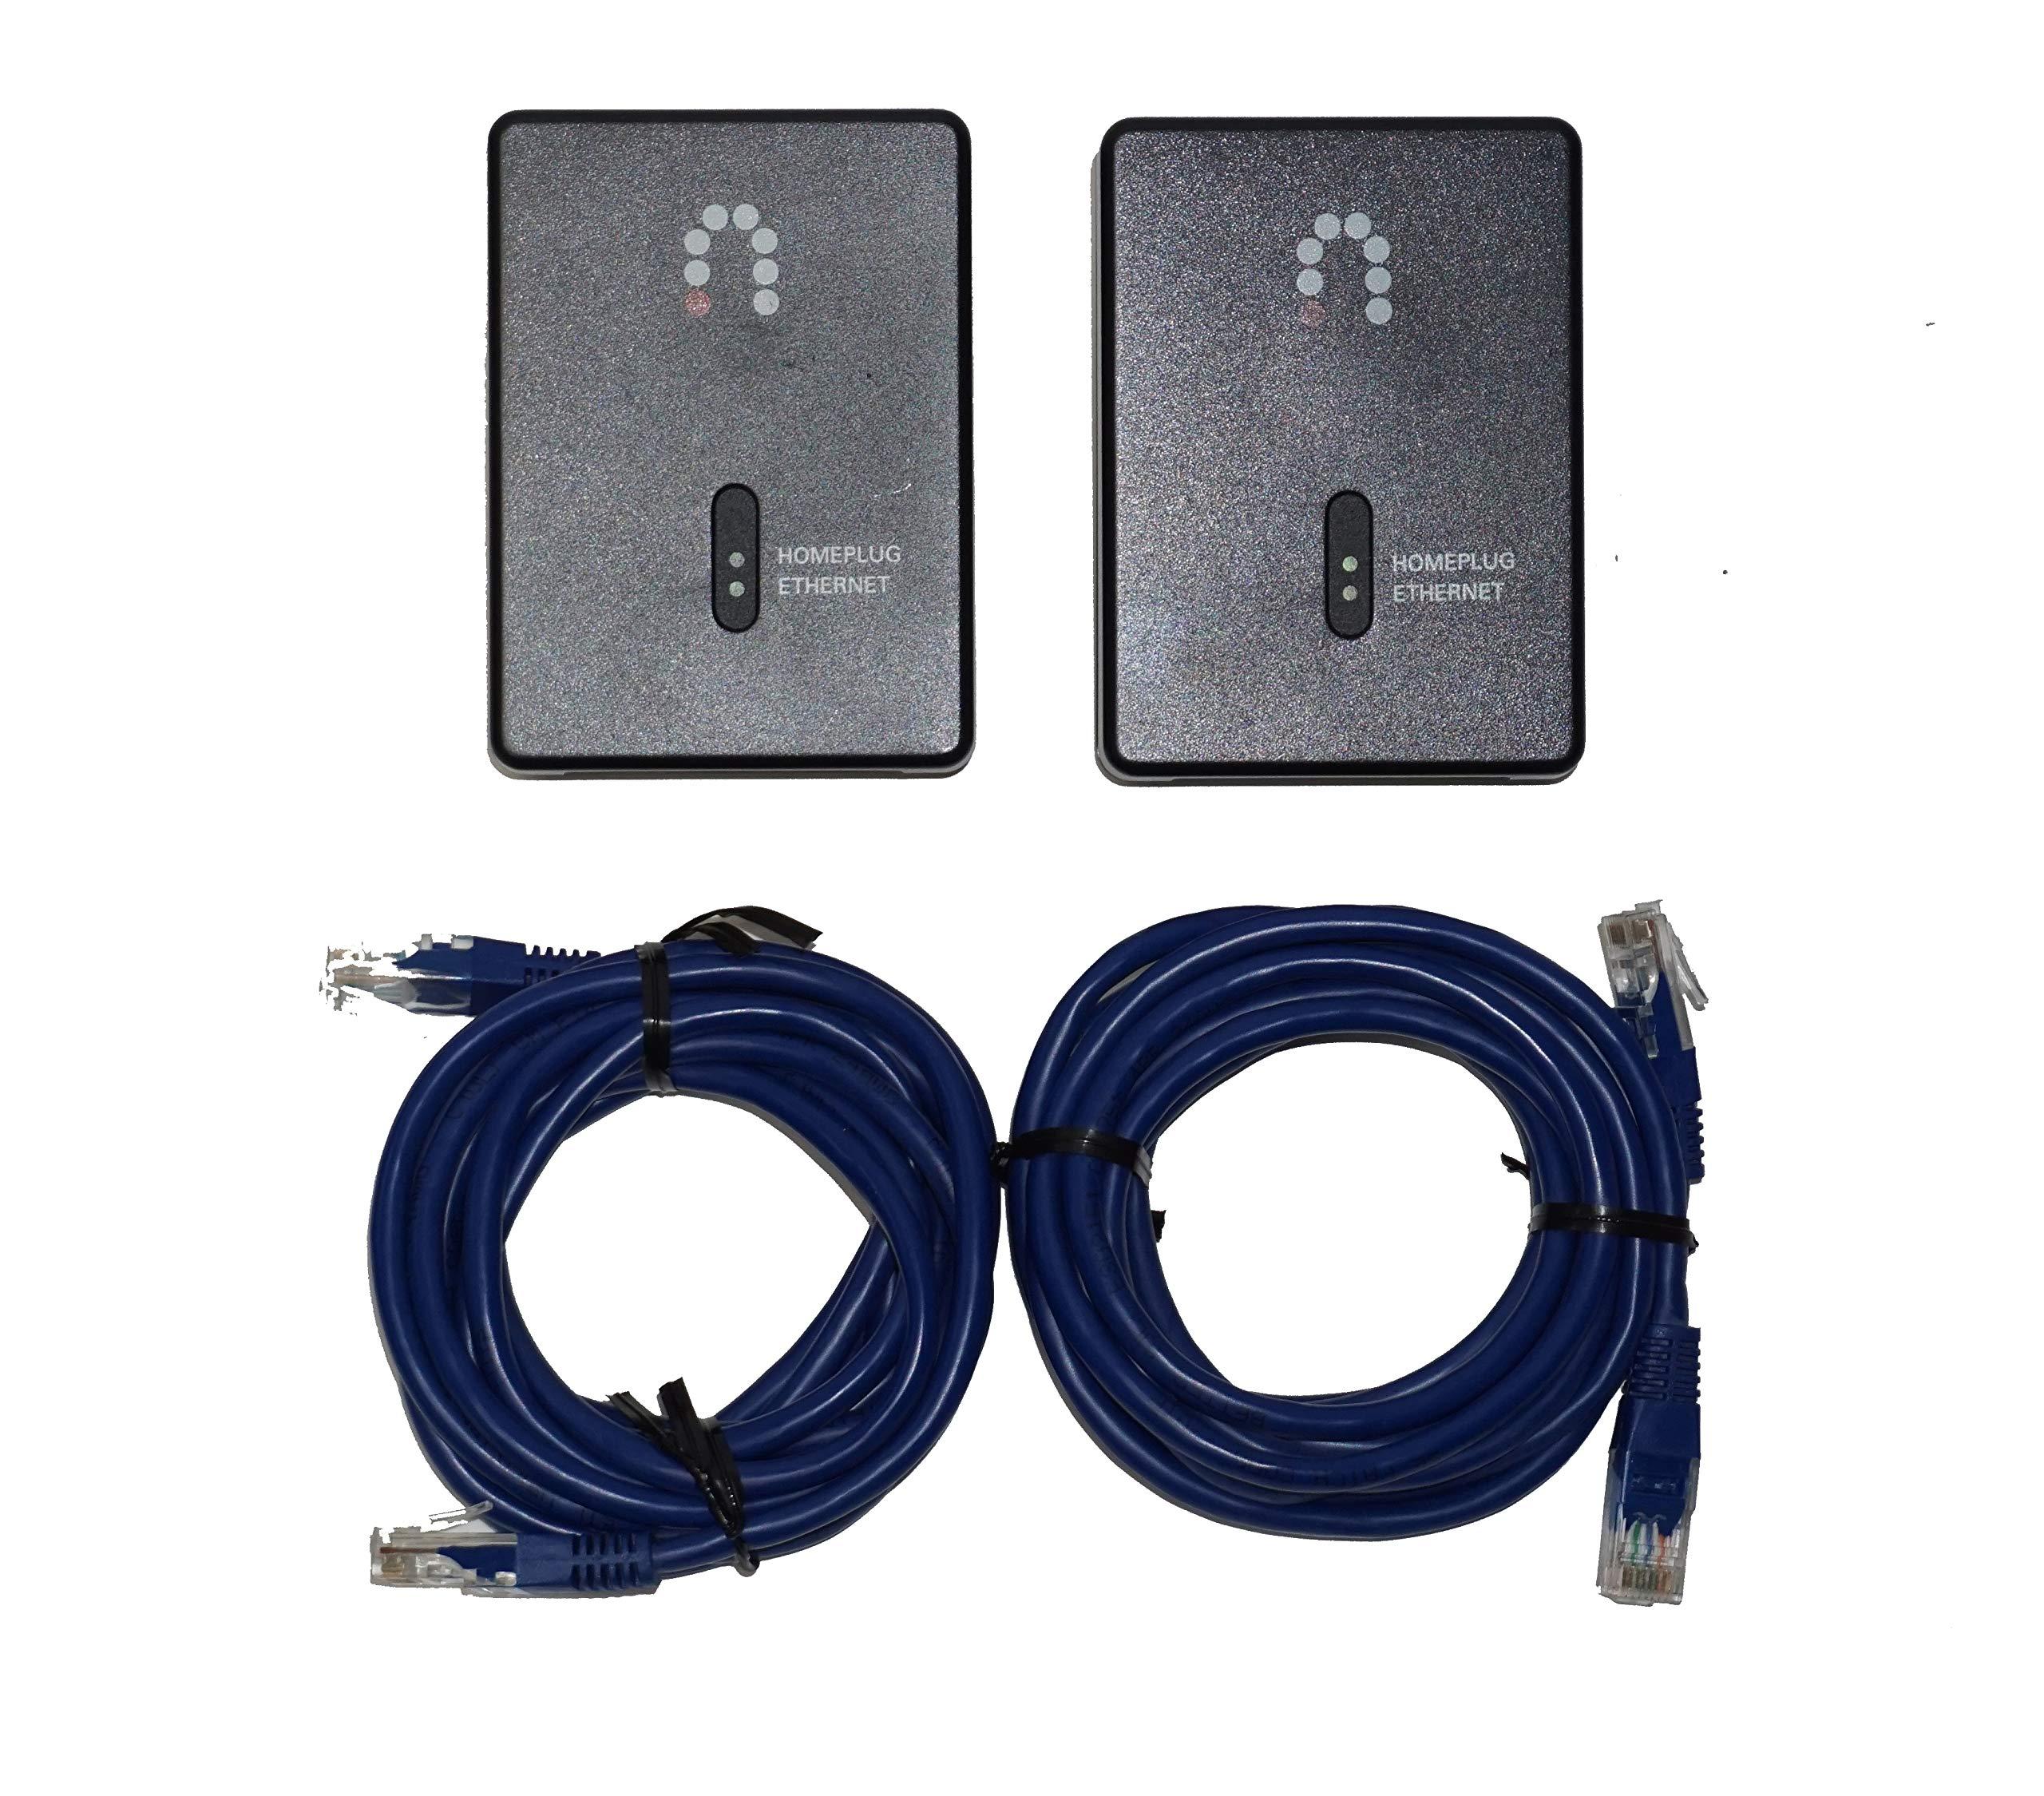 2 Pack - Sling Media SlingLink Turbo W1 HomePlug Ethernet Adapter (ES157089)